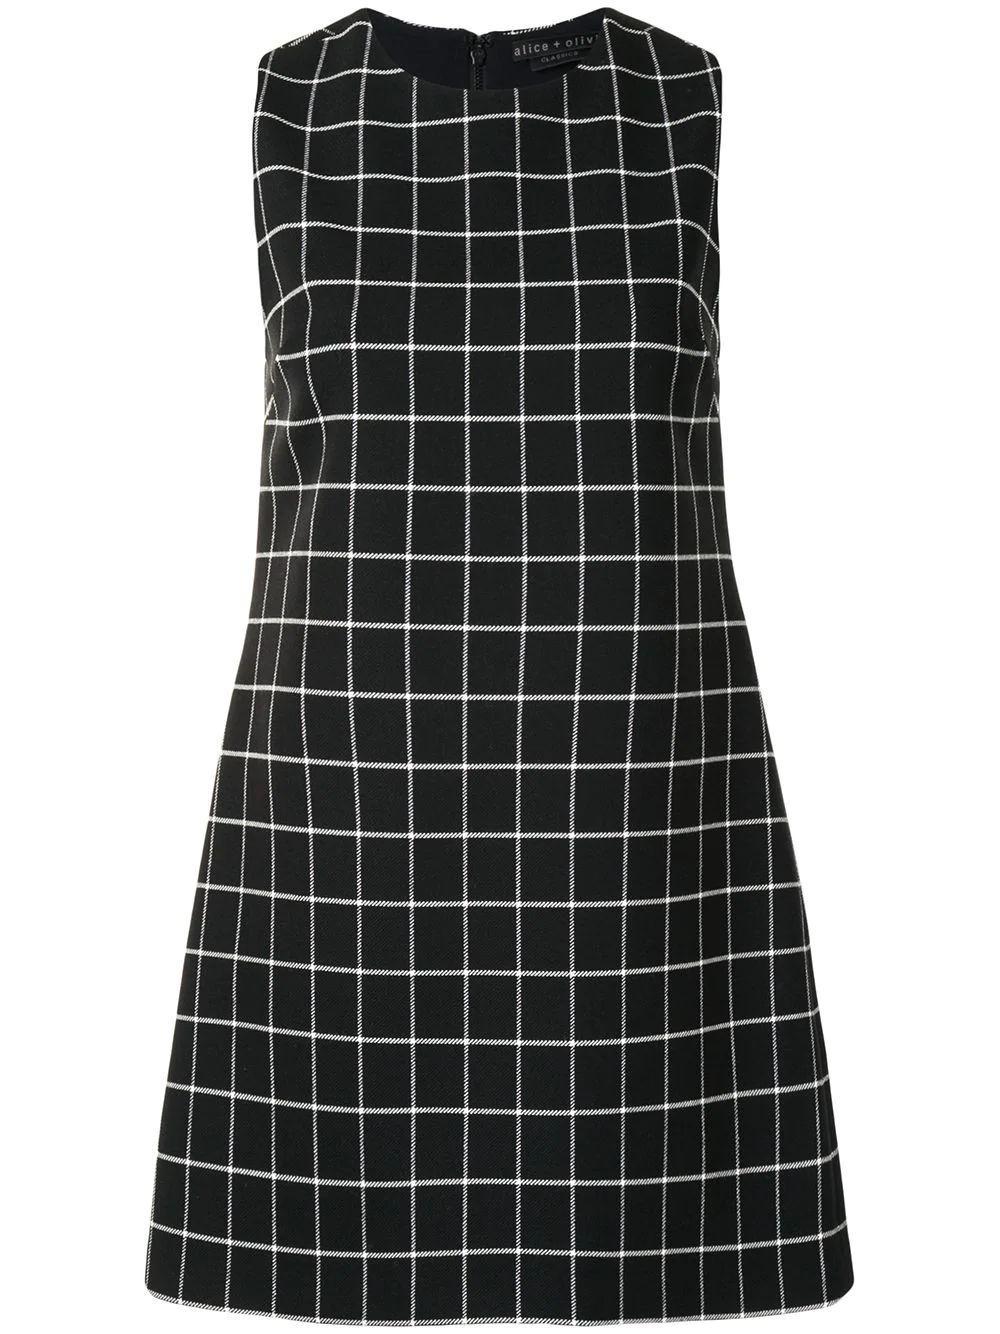 Coley Dress Item # CL000R28507